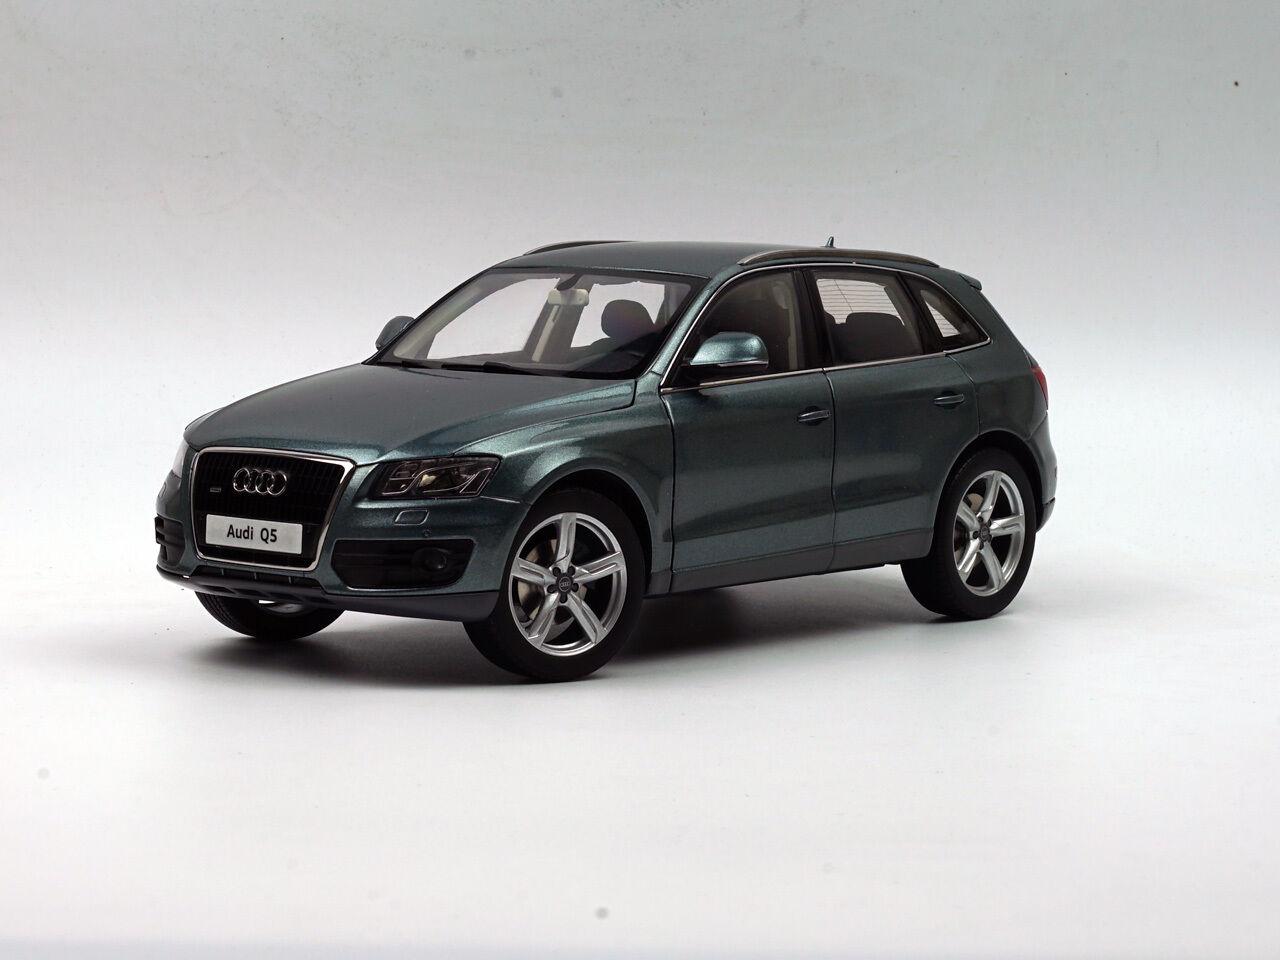 Audi q5 2012 ouarz kyosho 1,18 grauen druckguss metall - modell 09241gr